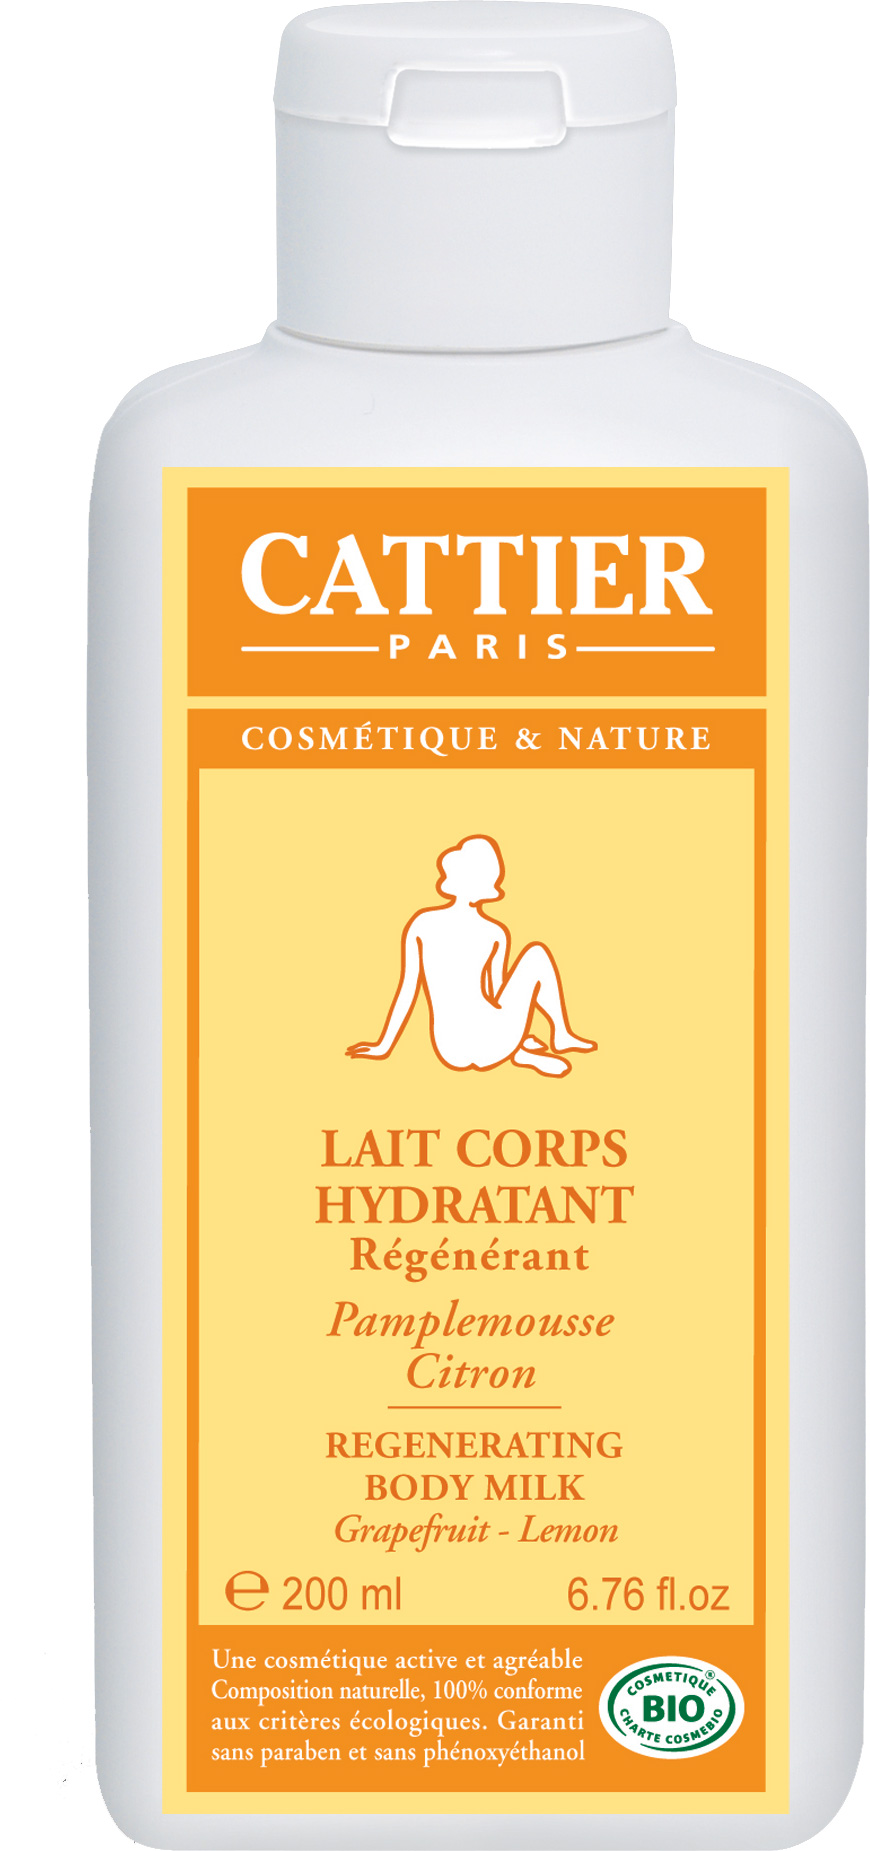 cattier lait corps hydratant r g n rant 200 ml boutique bio. Black Bedroom Furniture Sets. Home Design Ideas